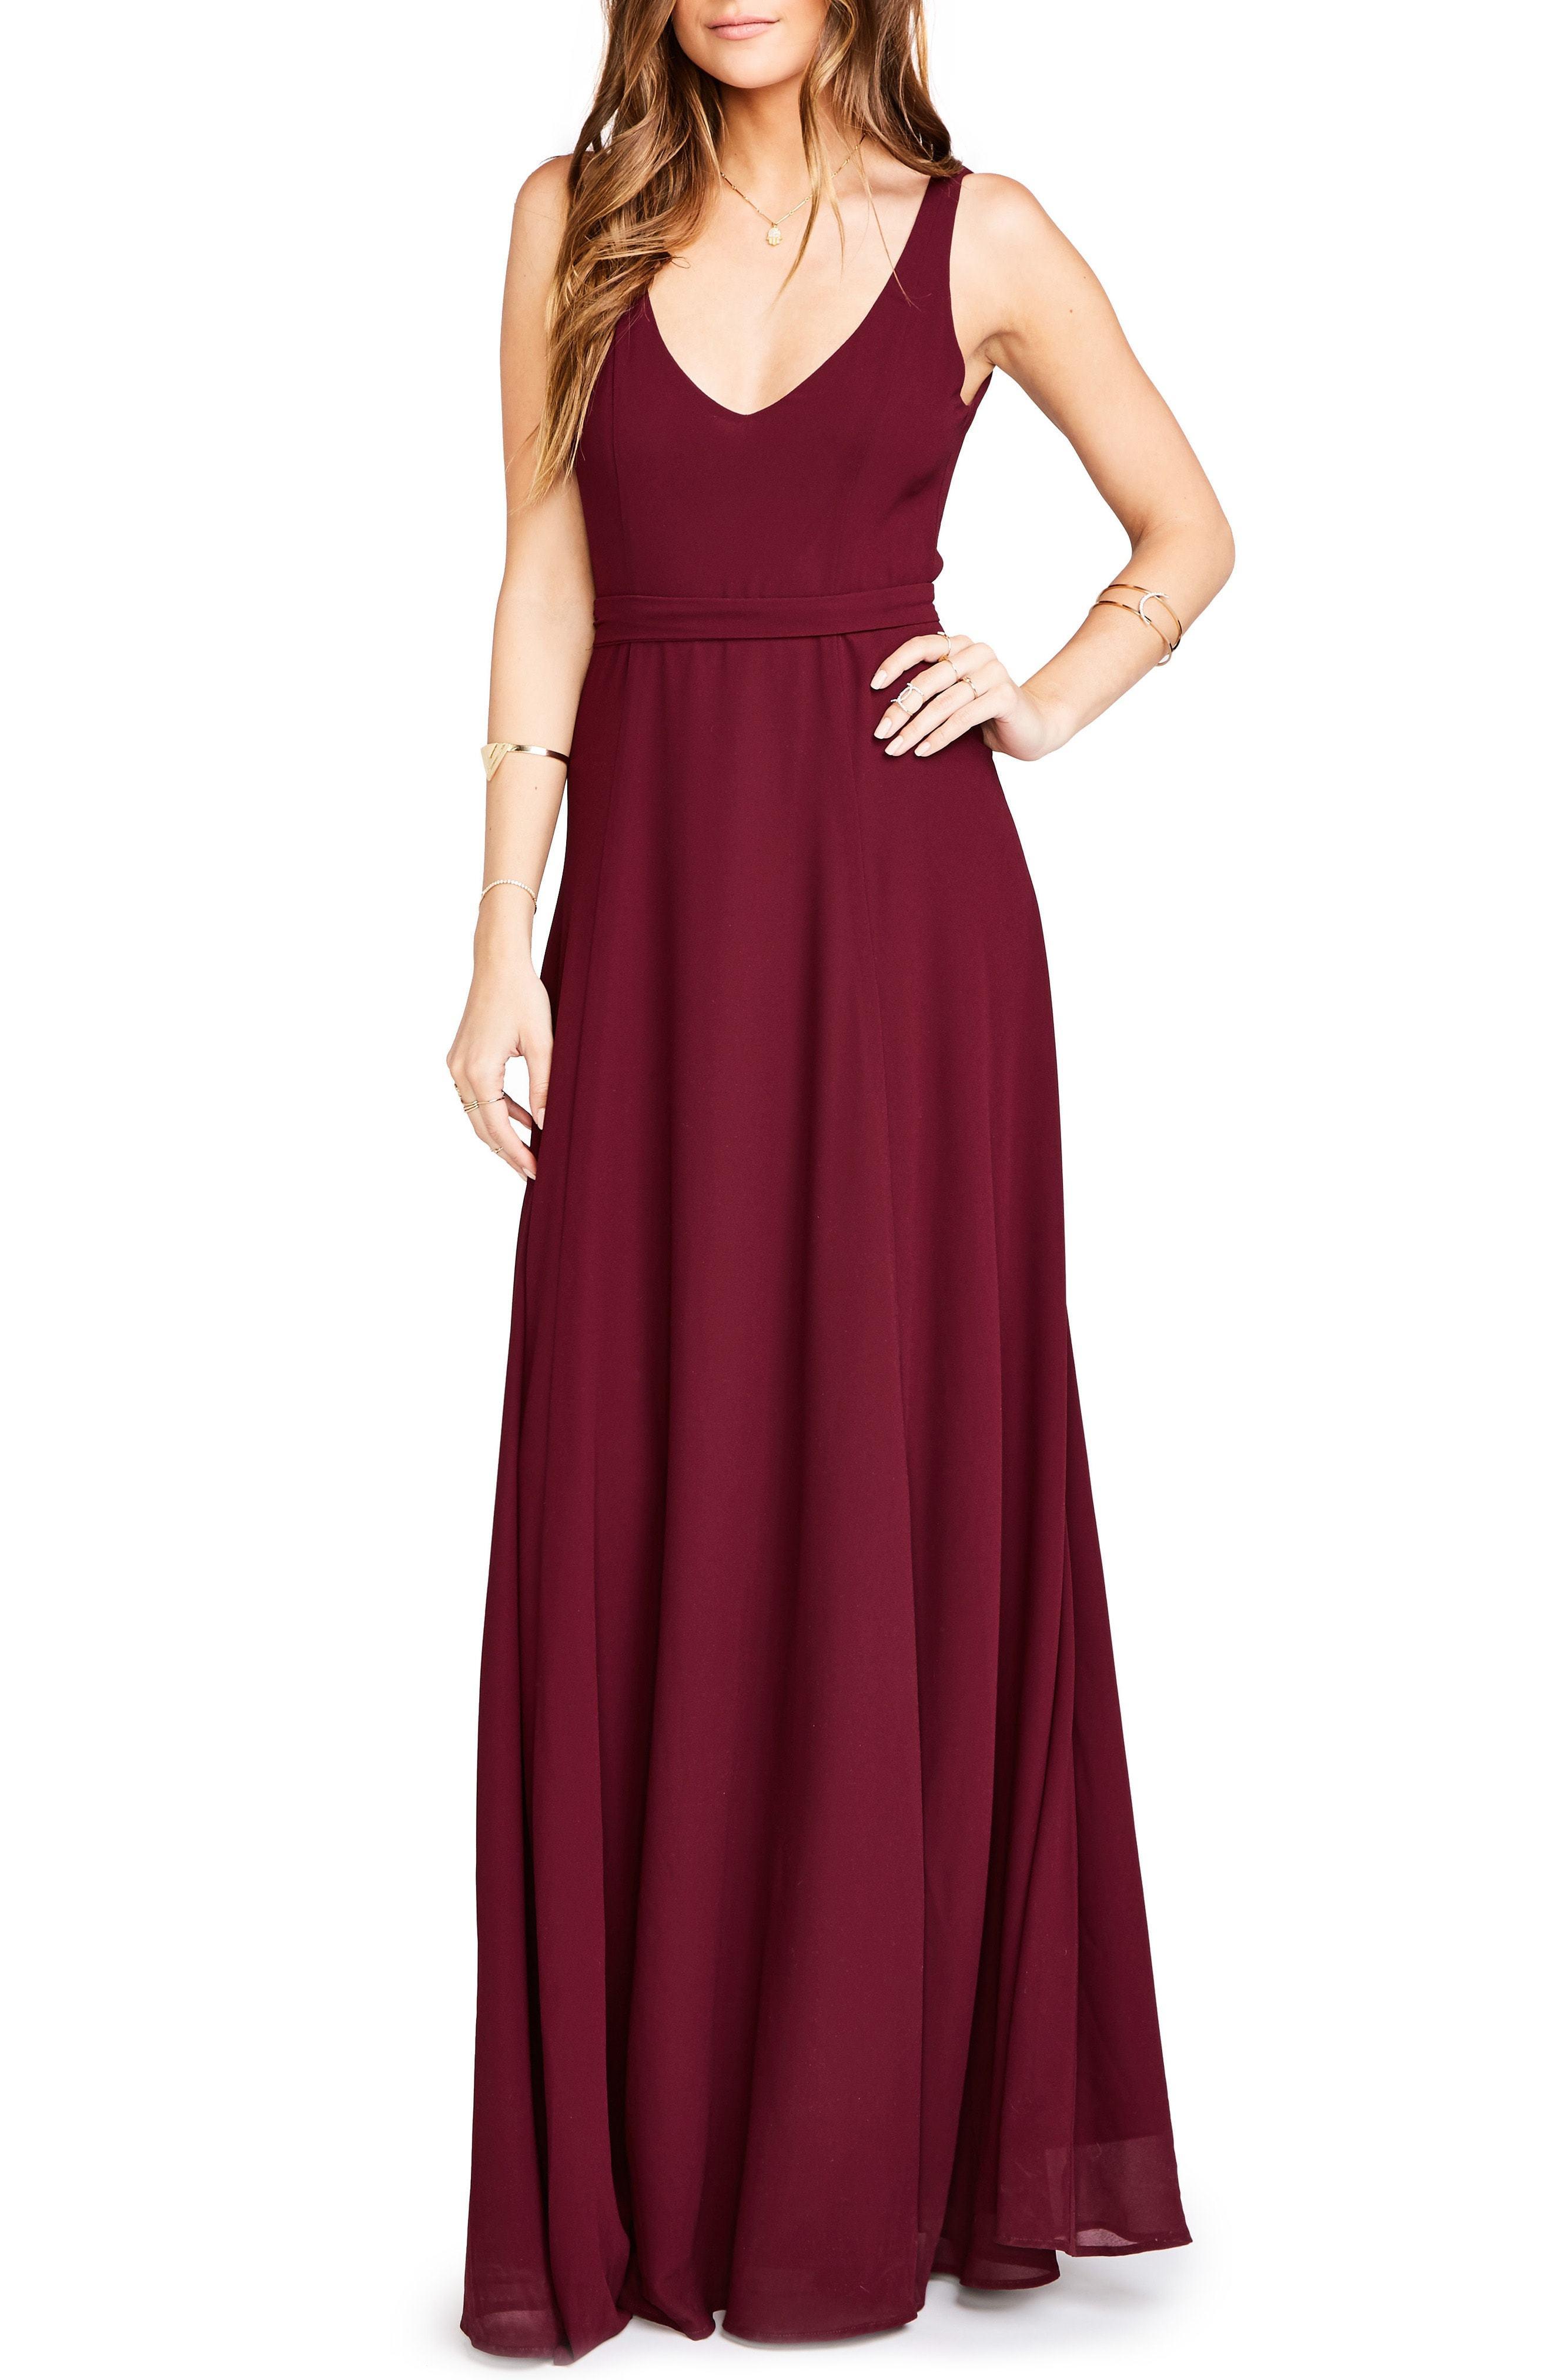 8e49bff7f46 Jen Maxi Gown. Dark Purple Chiffon Evening Dress by Show Me Your Mumu